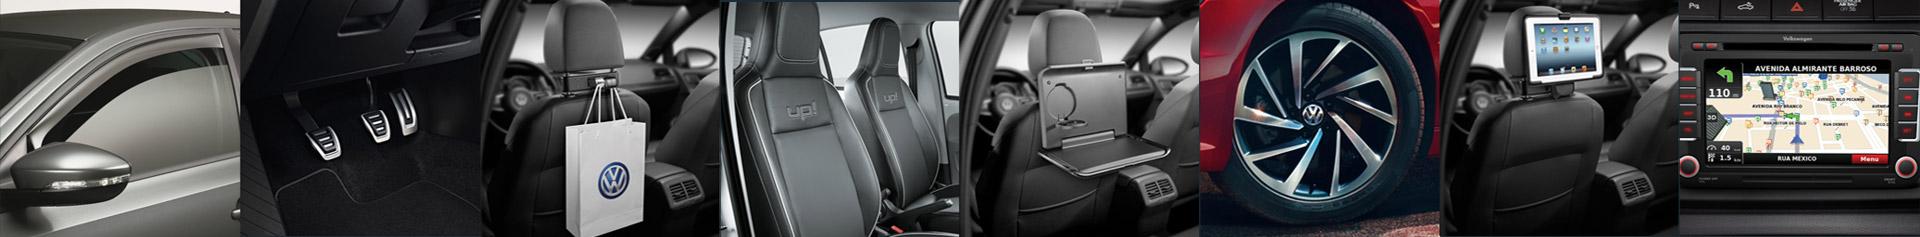 Acessórios F&I Volkswagen